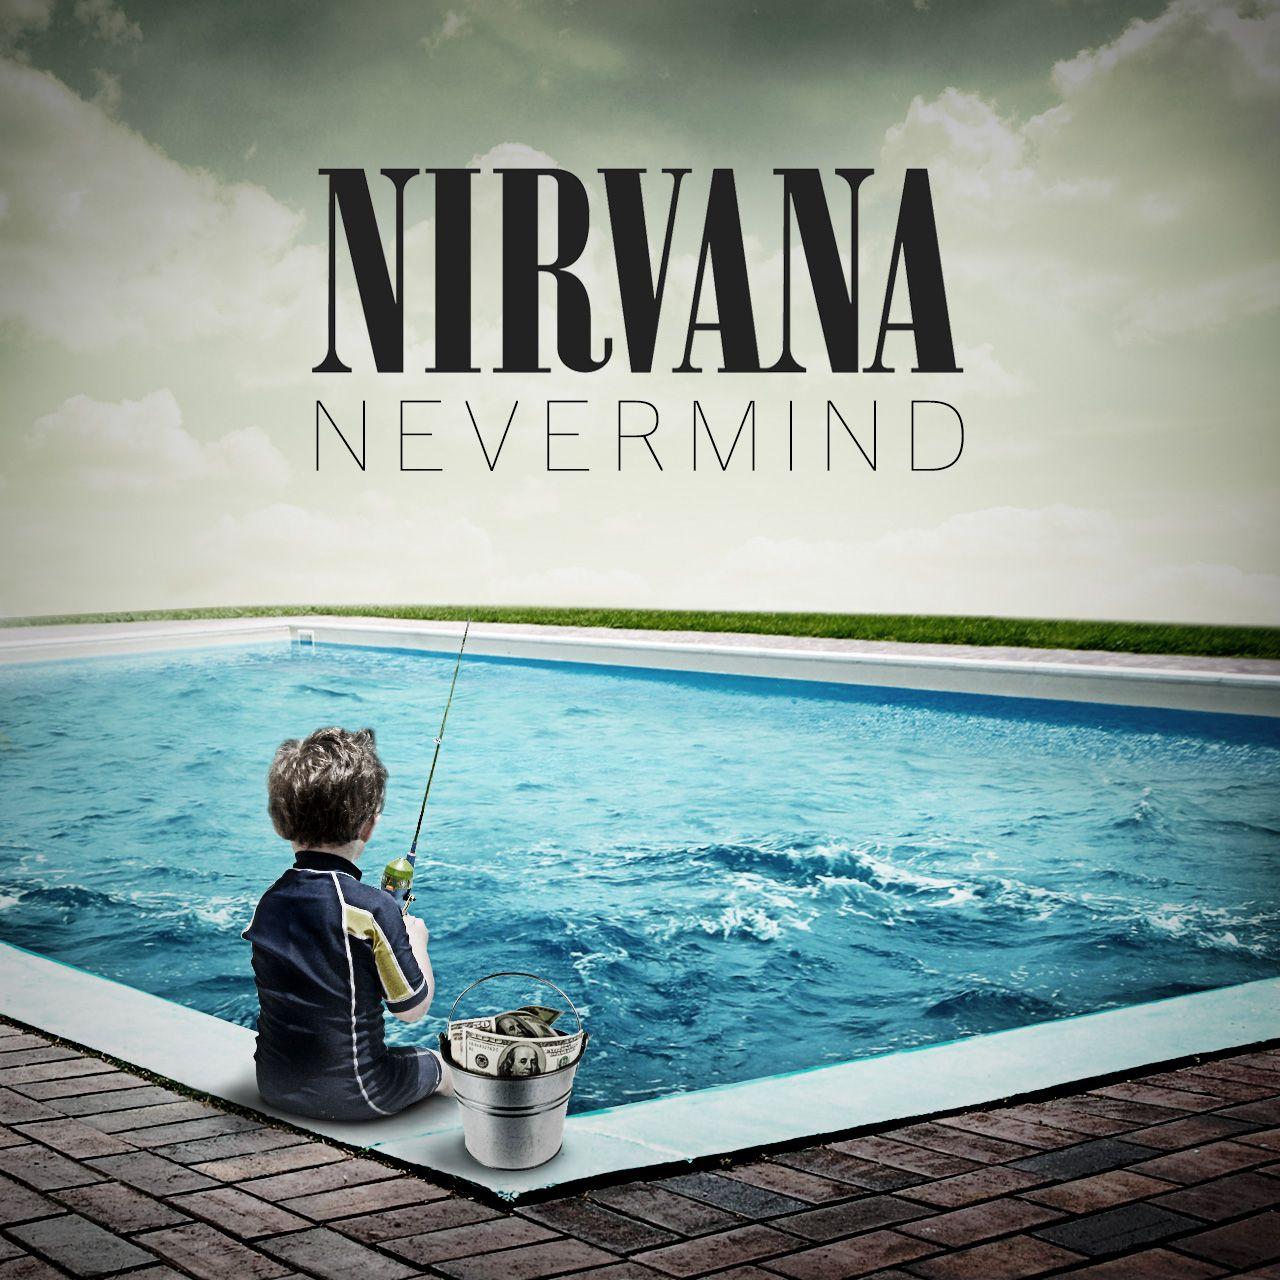 nirvana album cover letters nirvana album cover